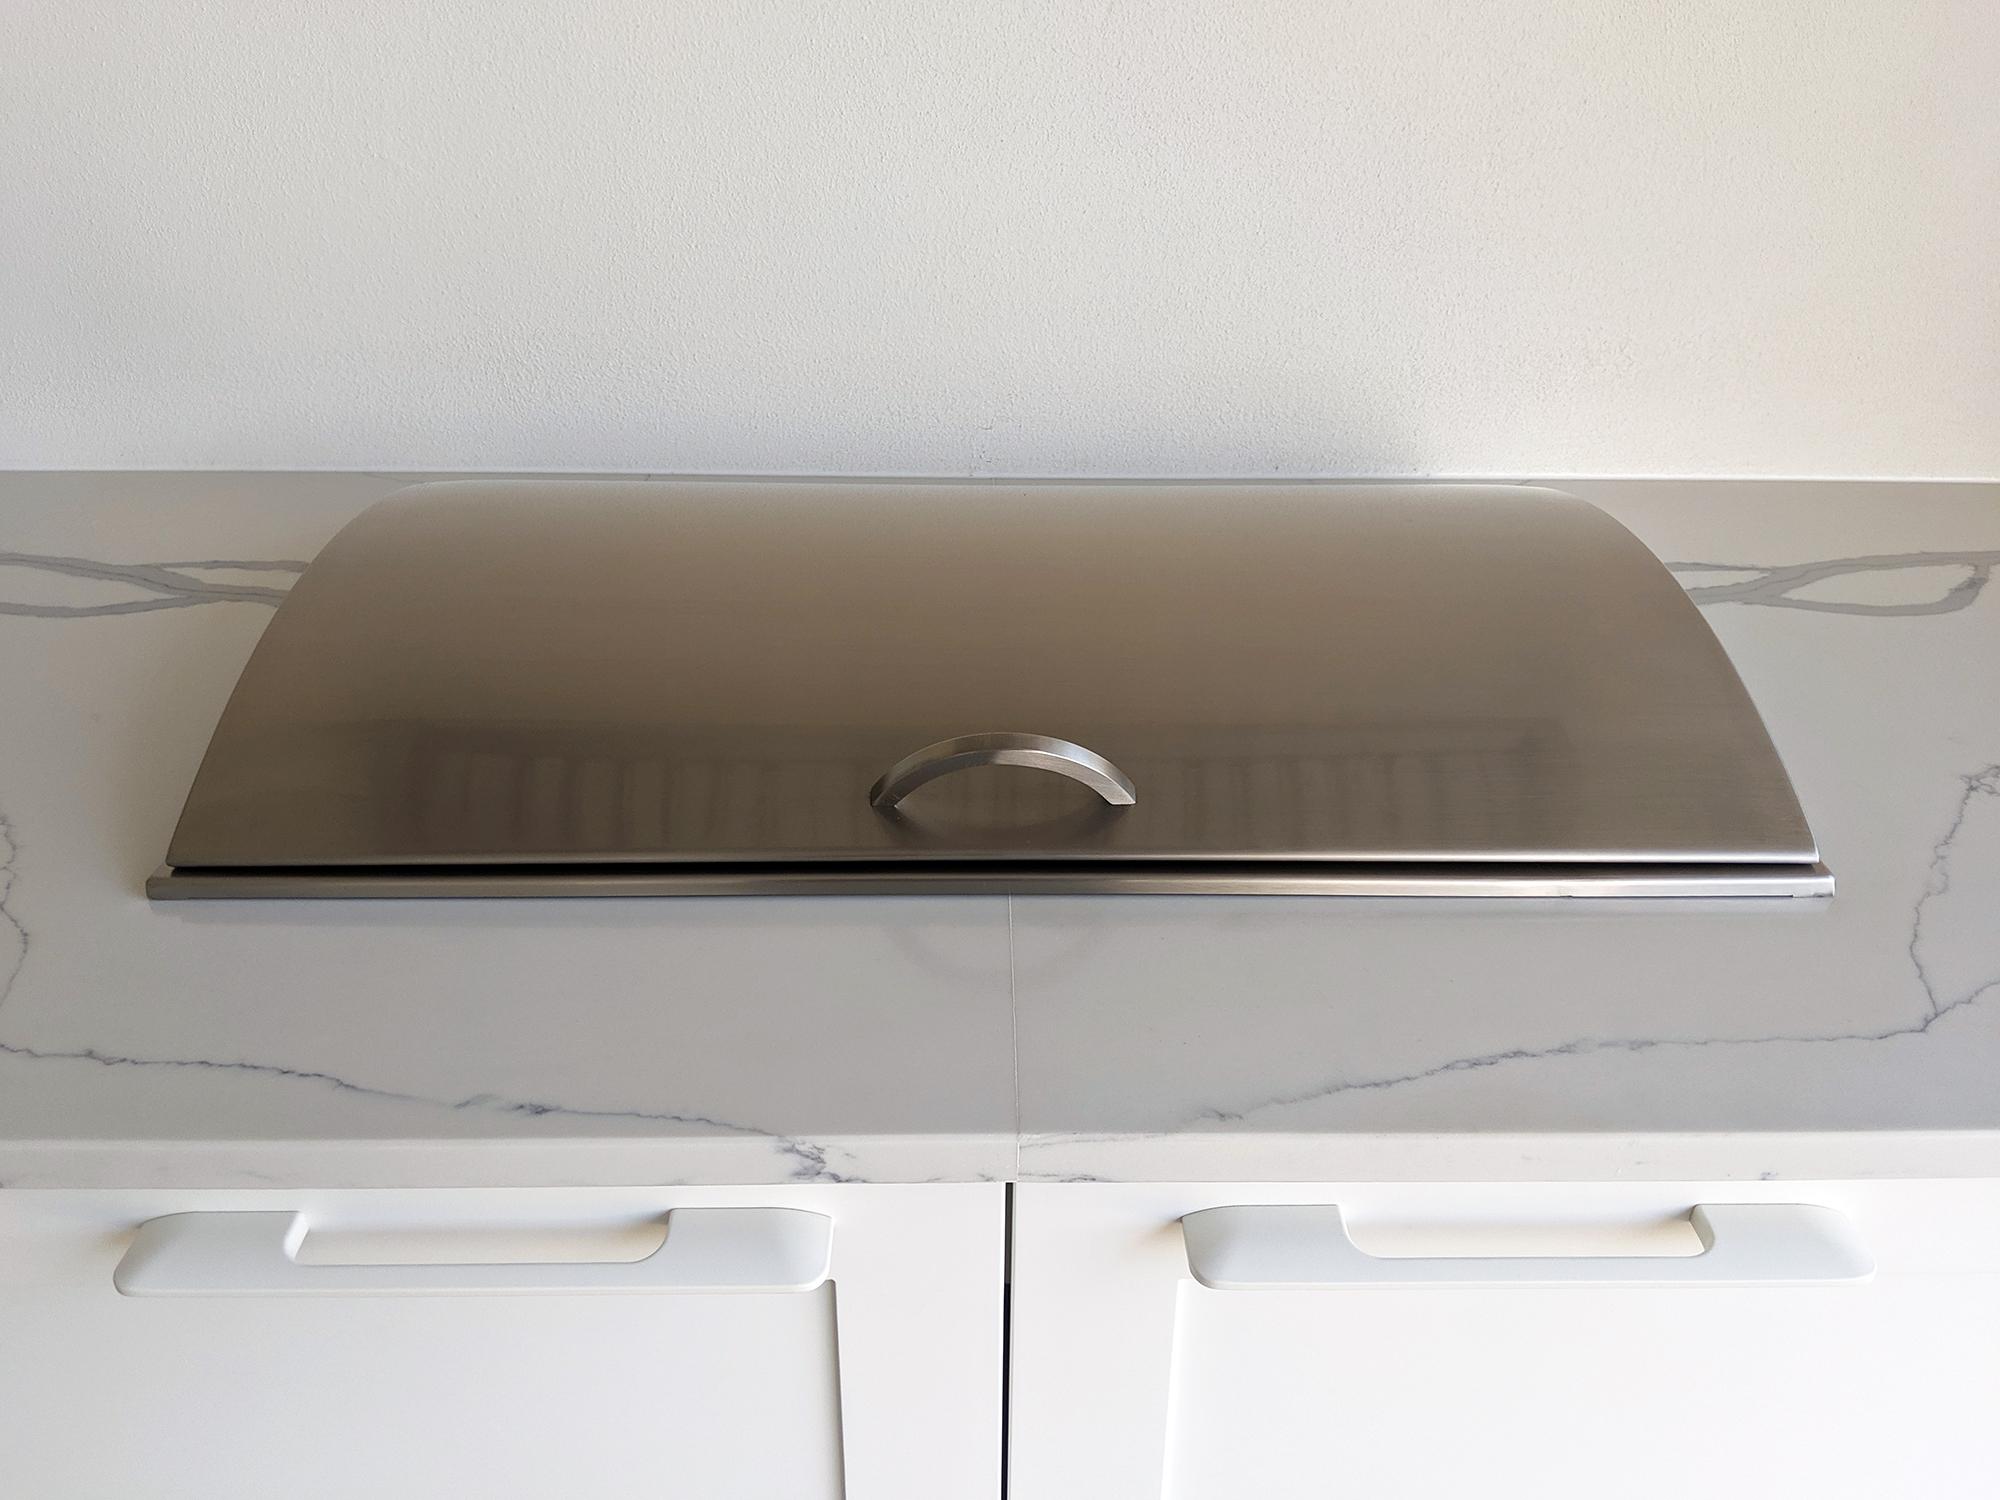 Australian stainless steel electric Infinity Teppanyaki BBQ